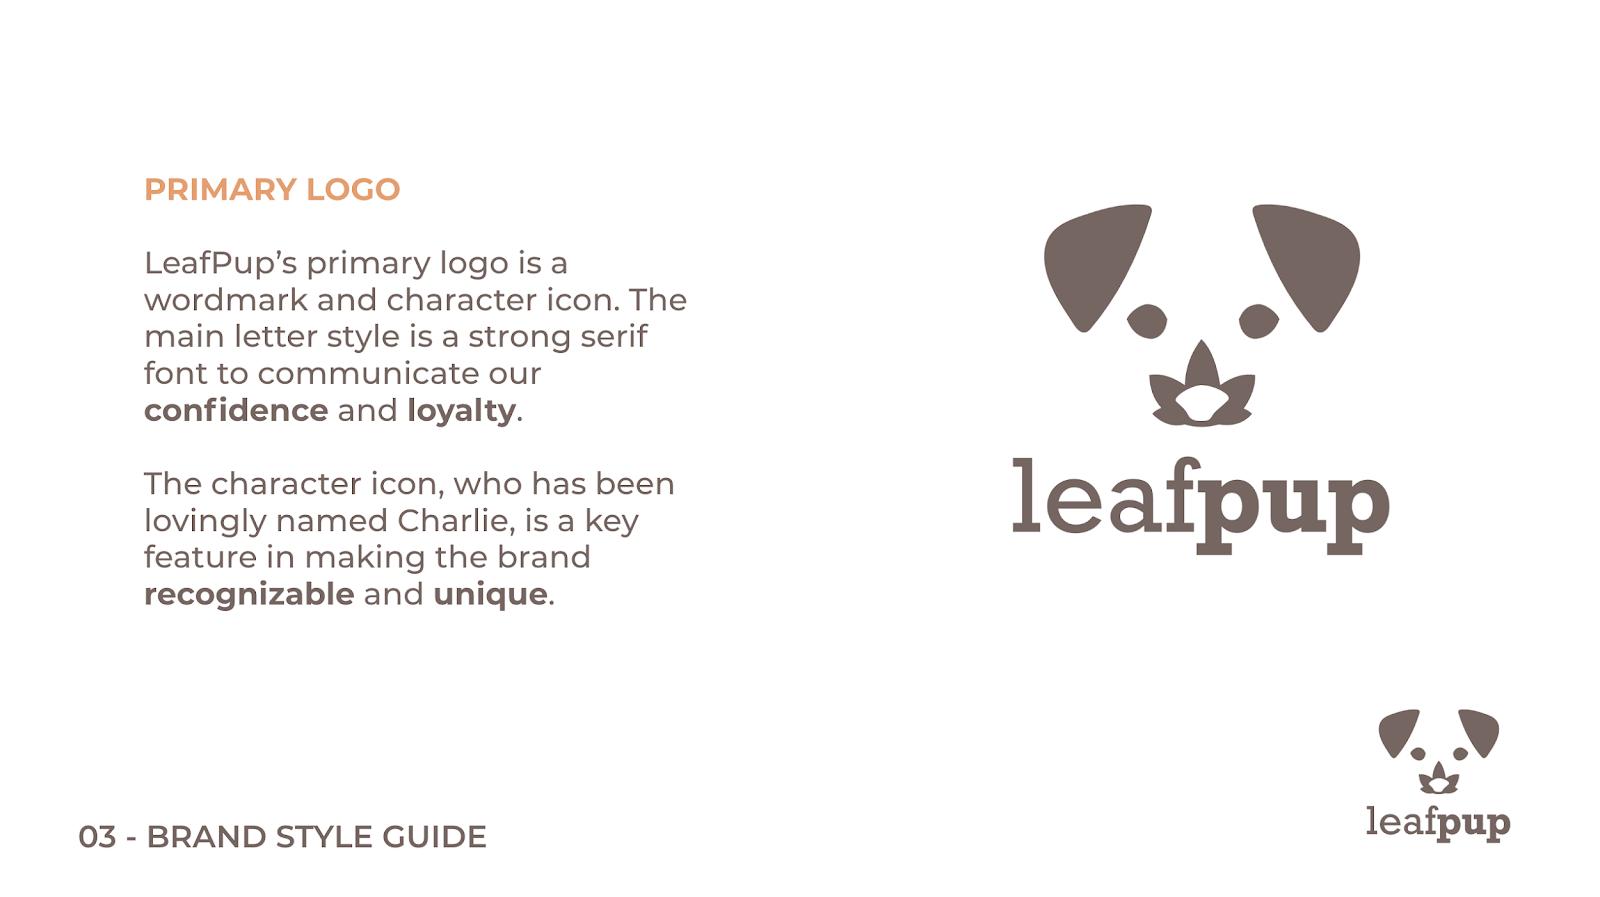 Leafpup's Primary Logo